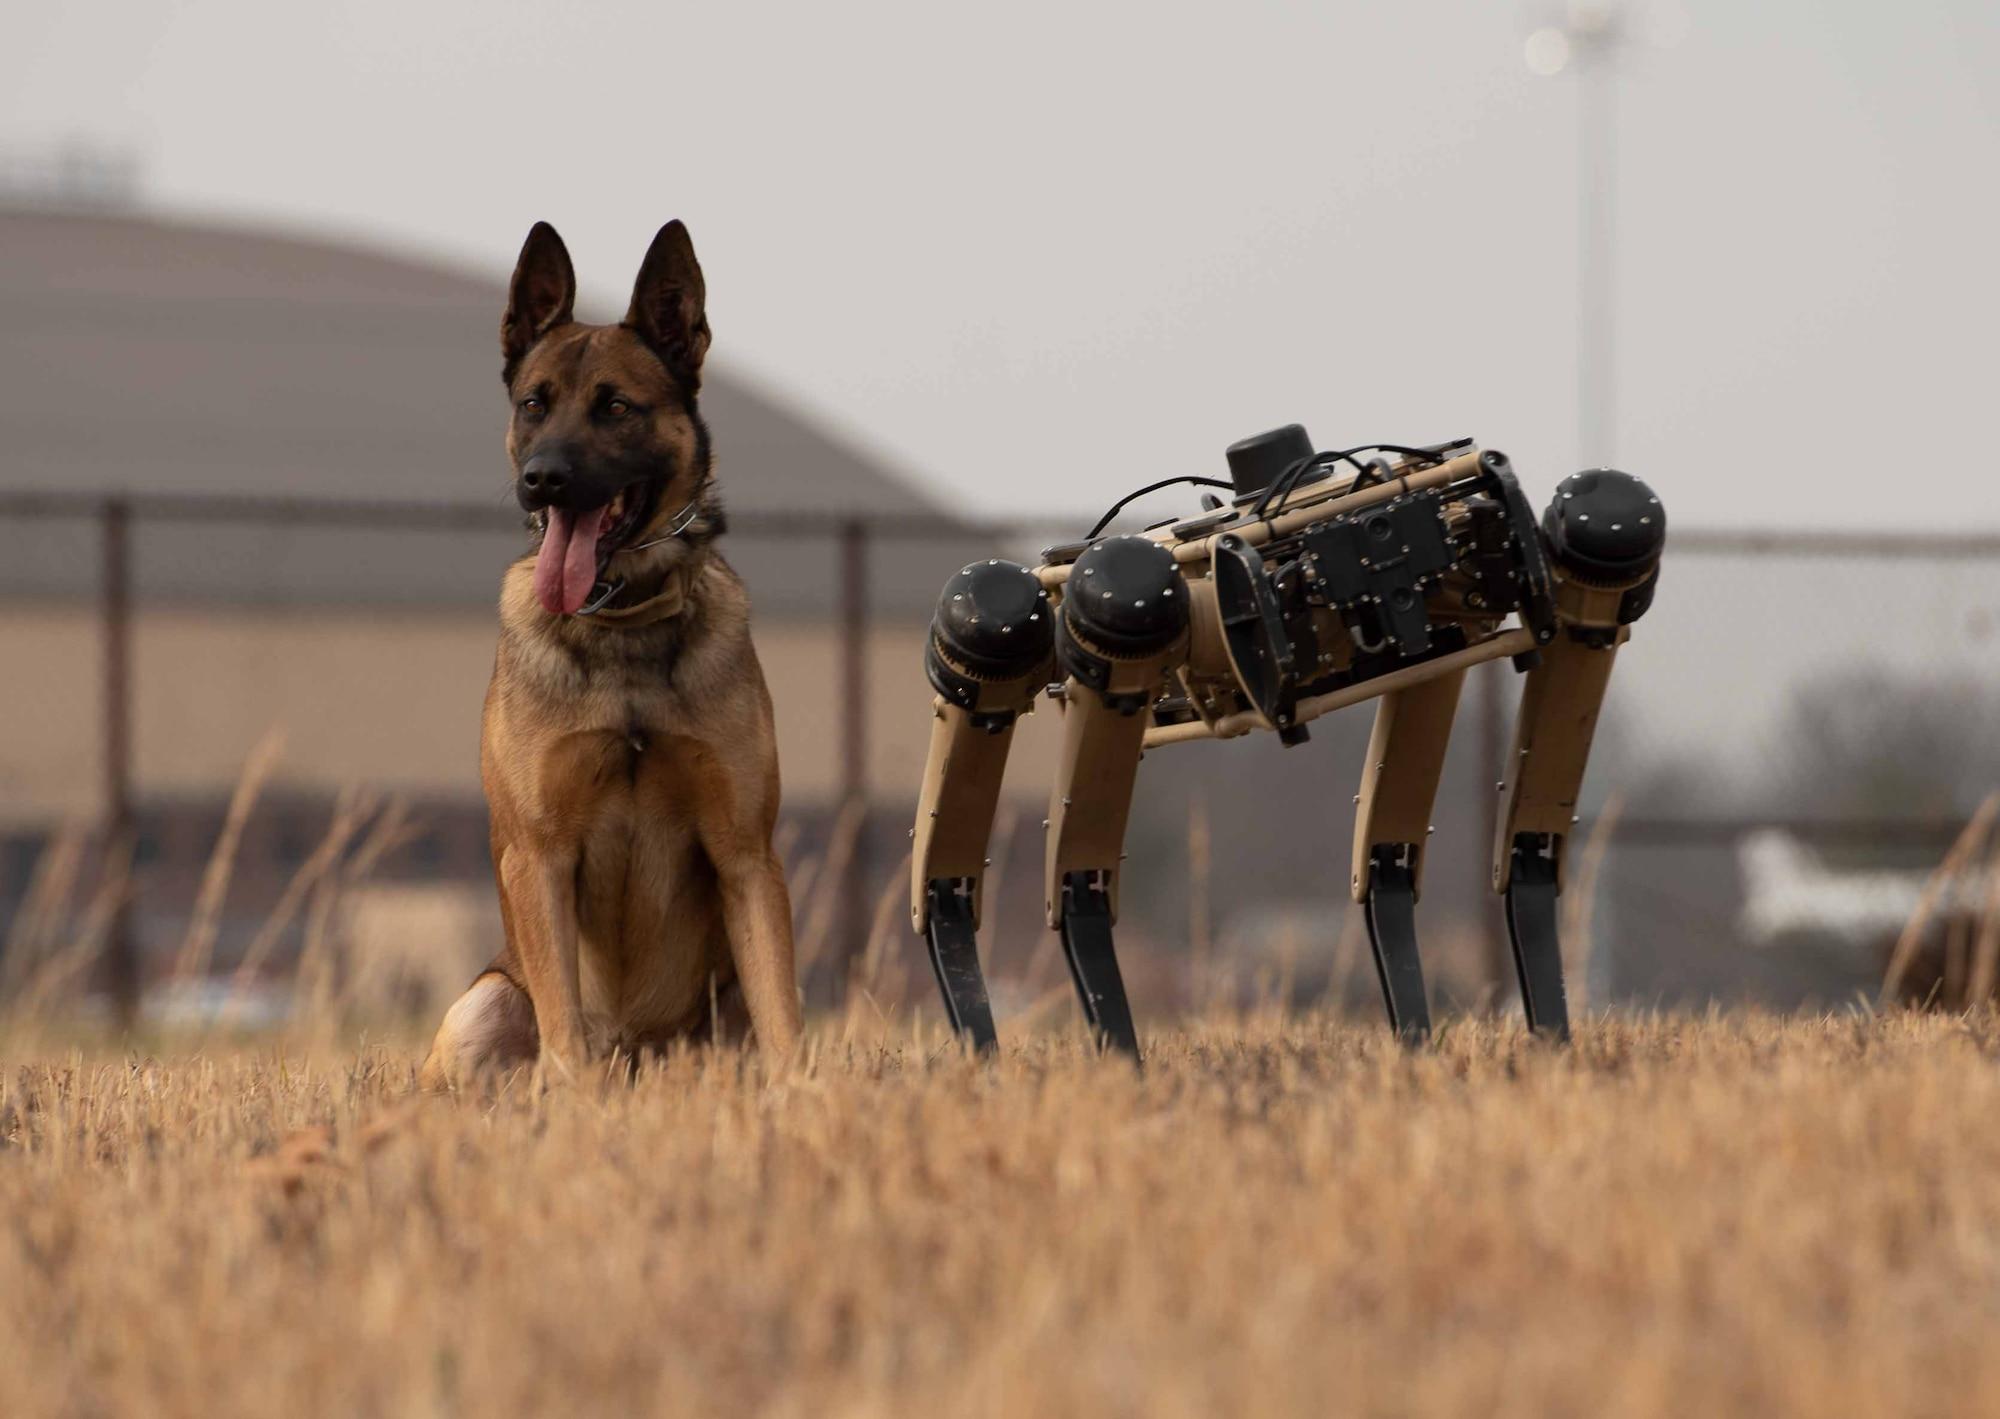 Robot dog and K-9 stand together